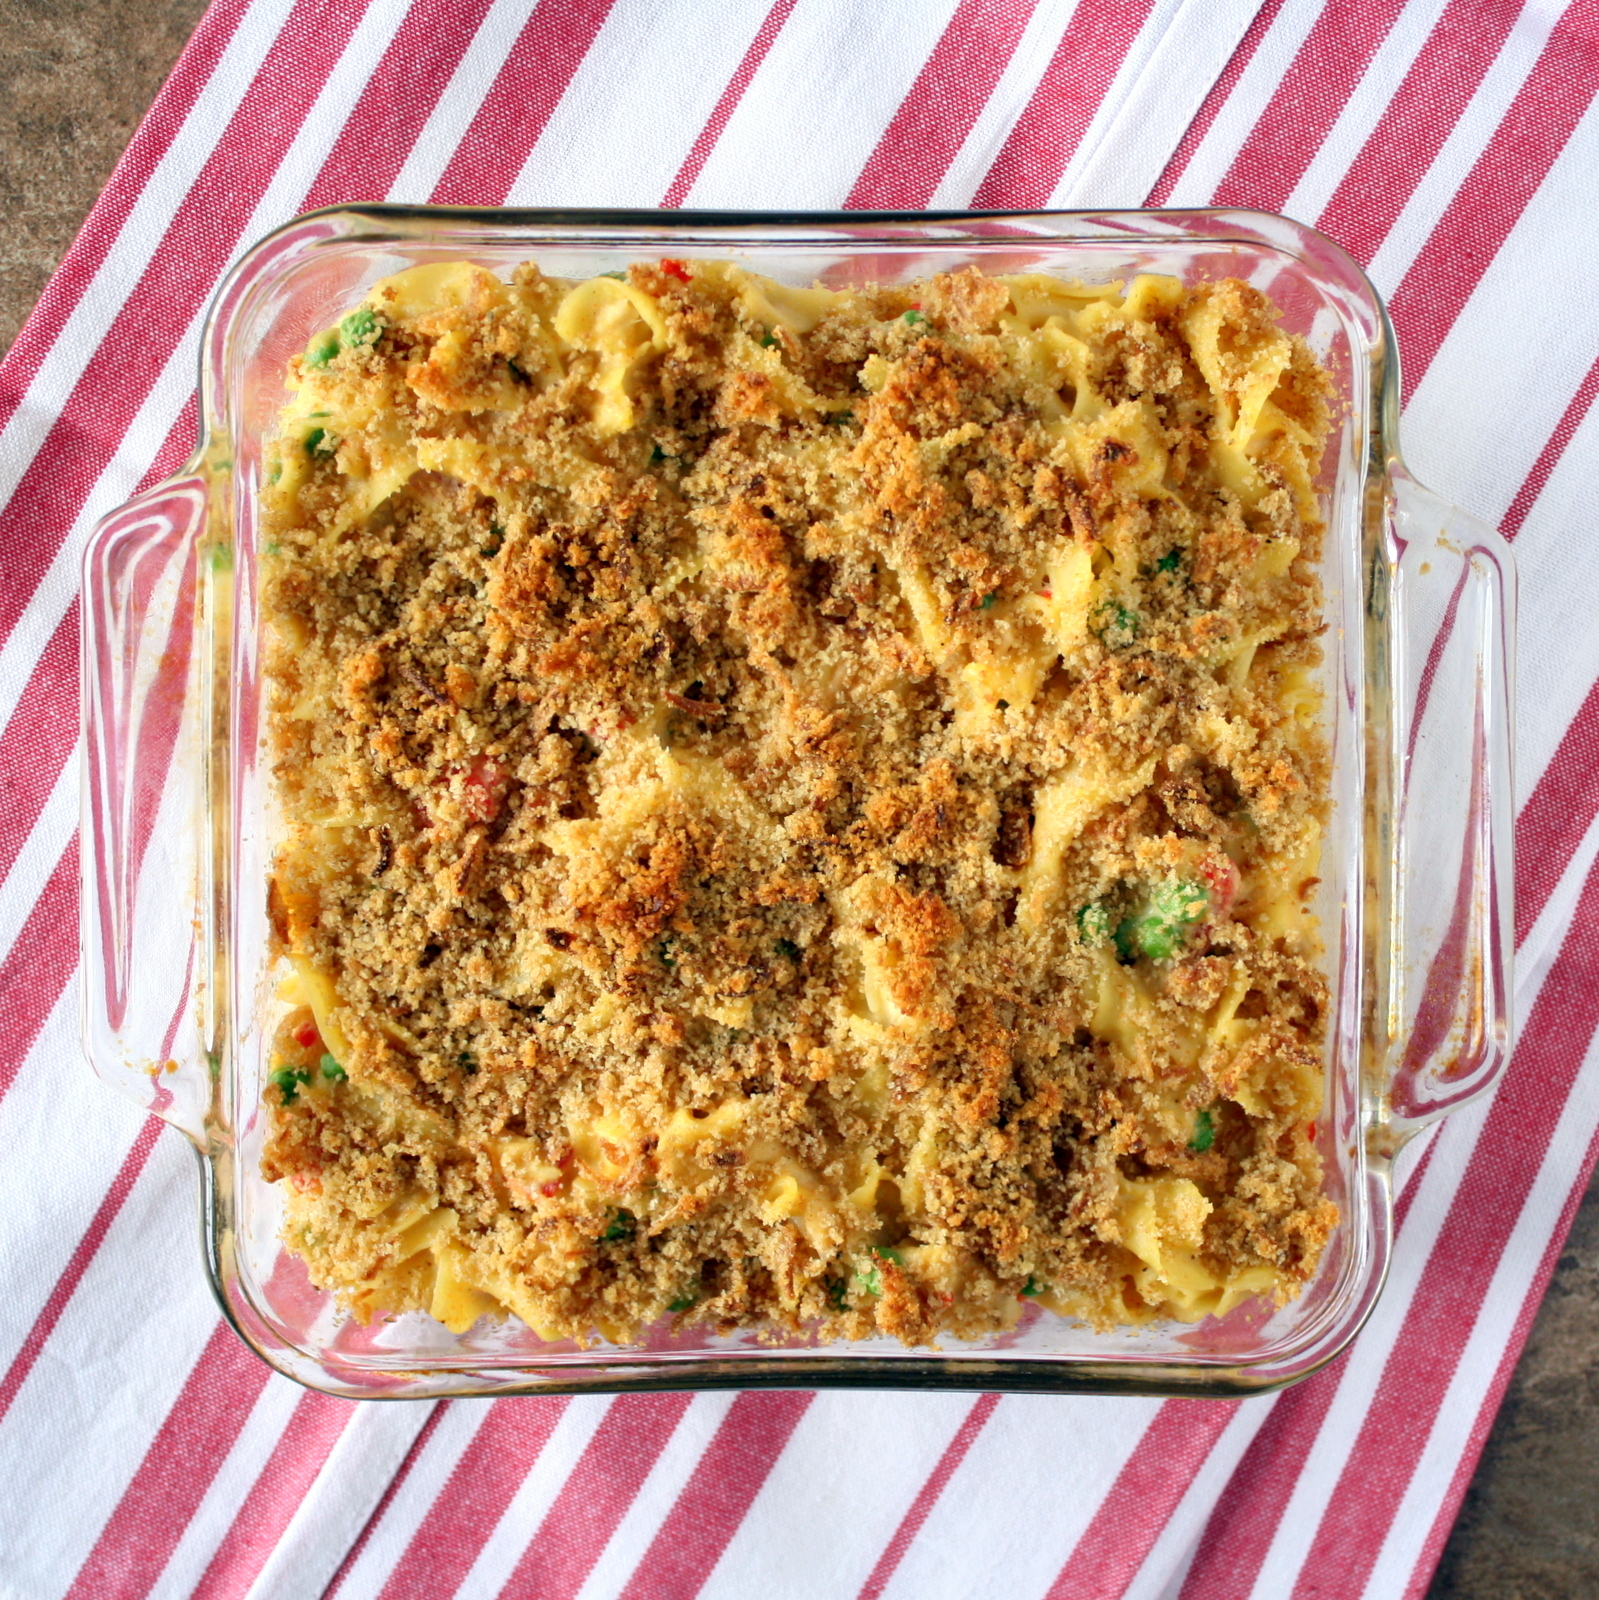 dairy-free tuna noodle casserole